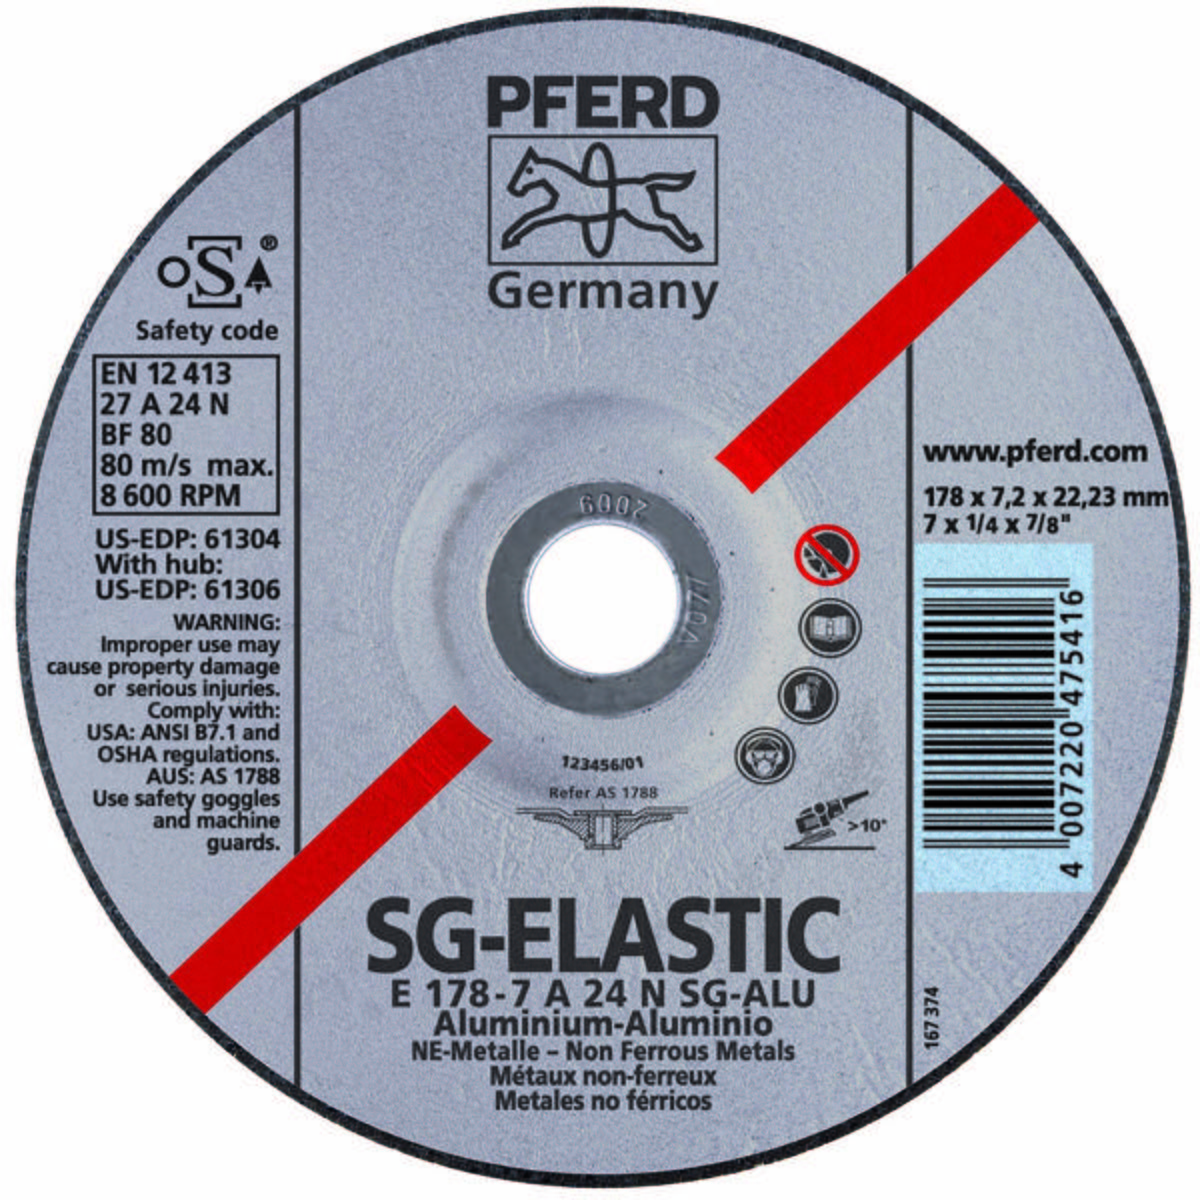 "4-1/2"" x 1/4"" Grinding Wheel, 5/8-11 Thd. A 30 N SG-INOX - Type 27"